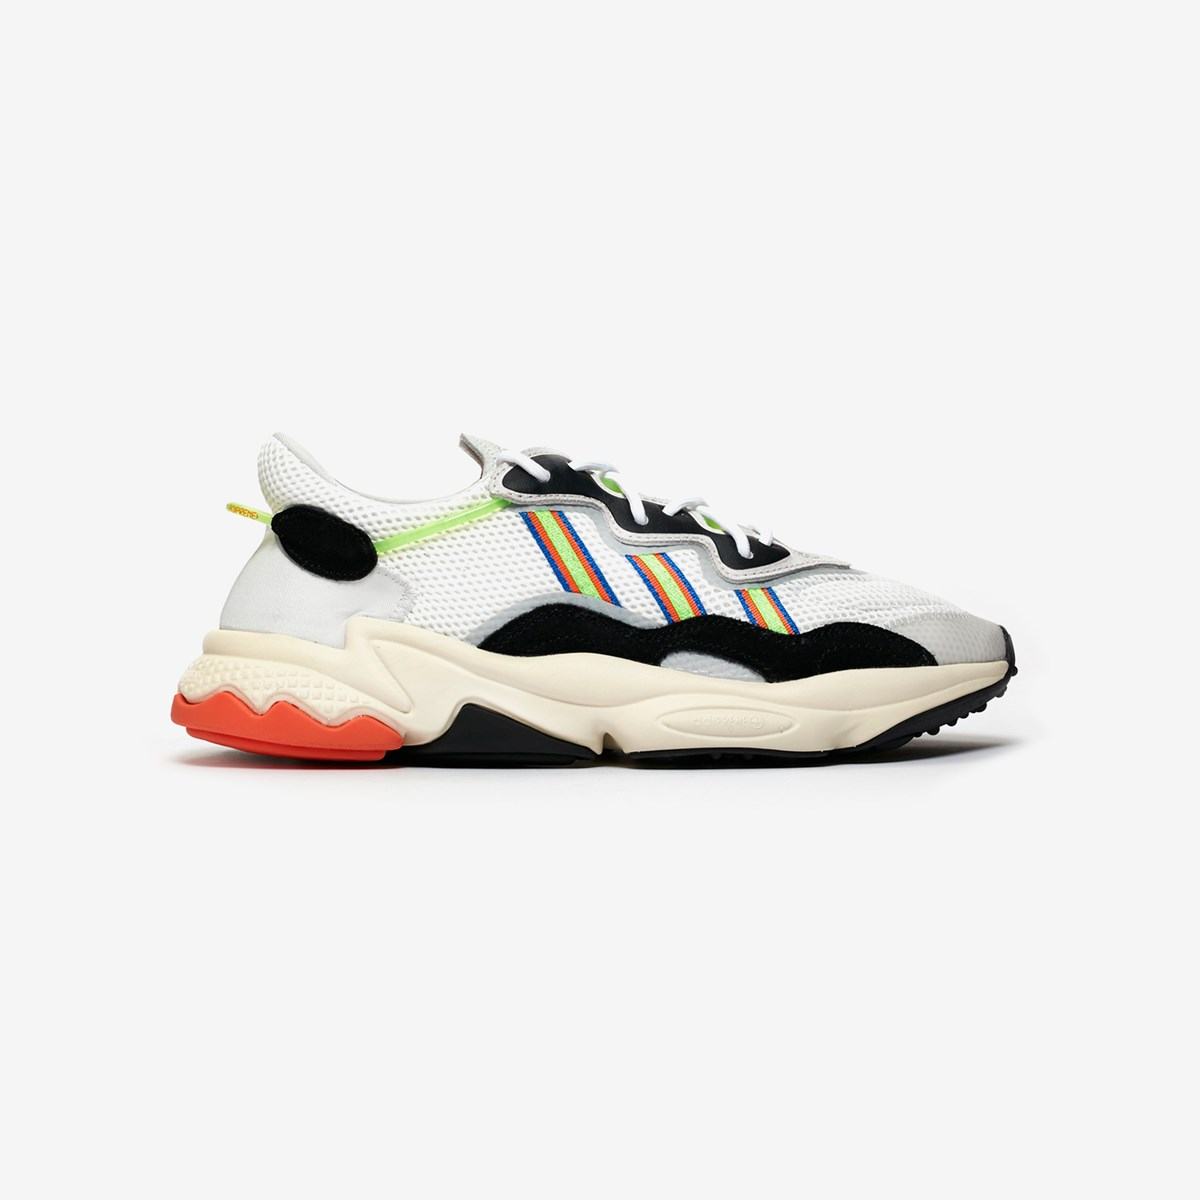 "adidas Ozweego ""Era Pack�?WhiteScream Green For Sale �?The"